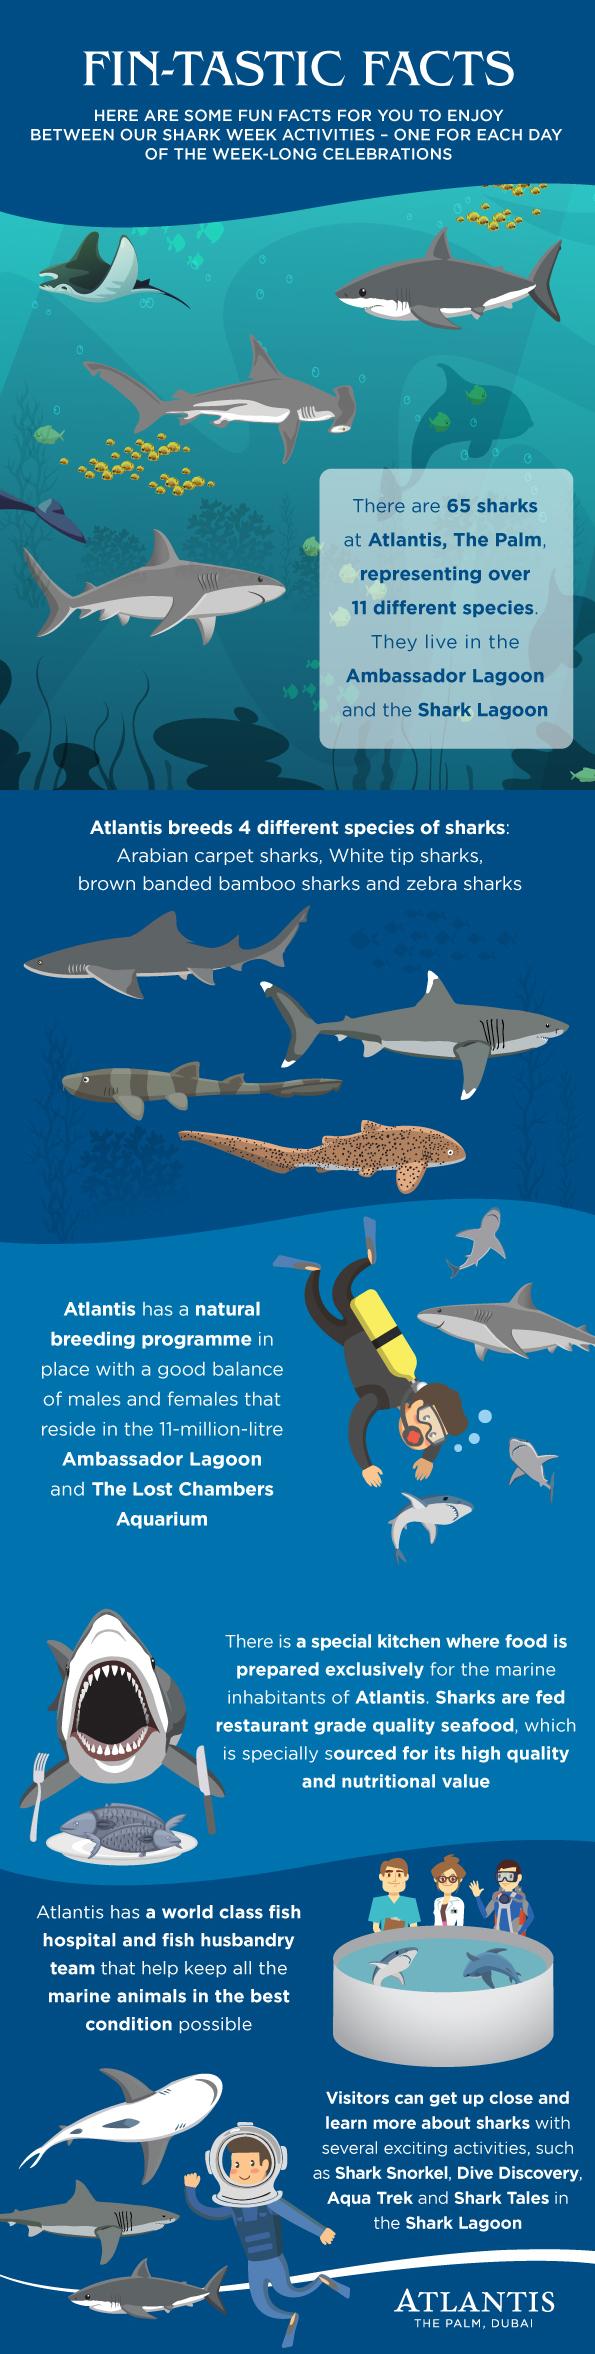 6 Jaw-some Atlantis Shark Week Facts | Atlantis, The Palm